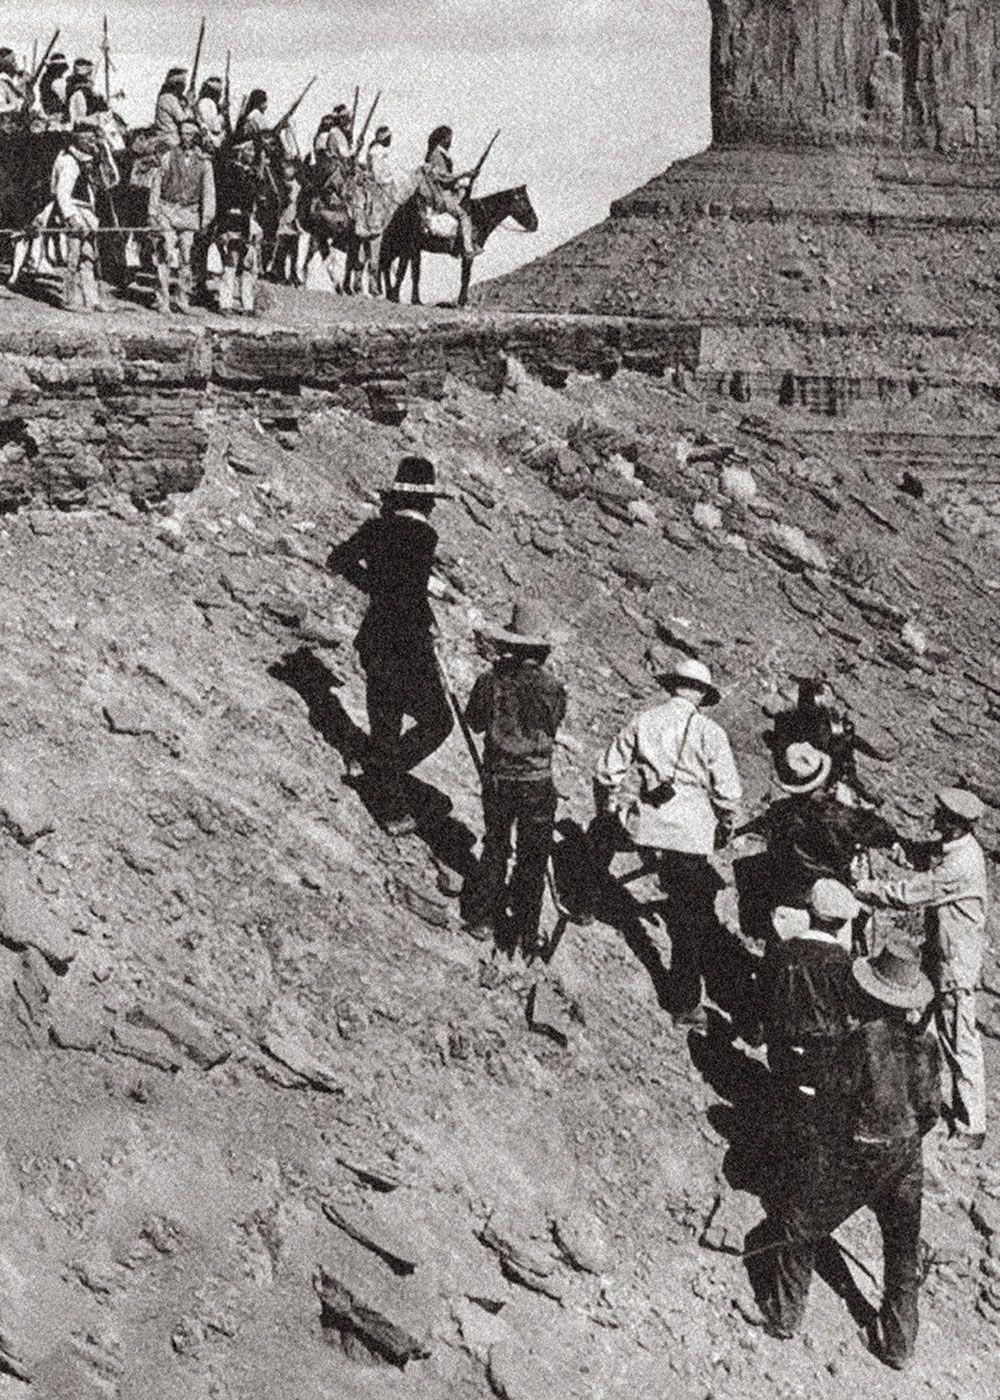 stagecoach filming monument valley true west magazine